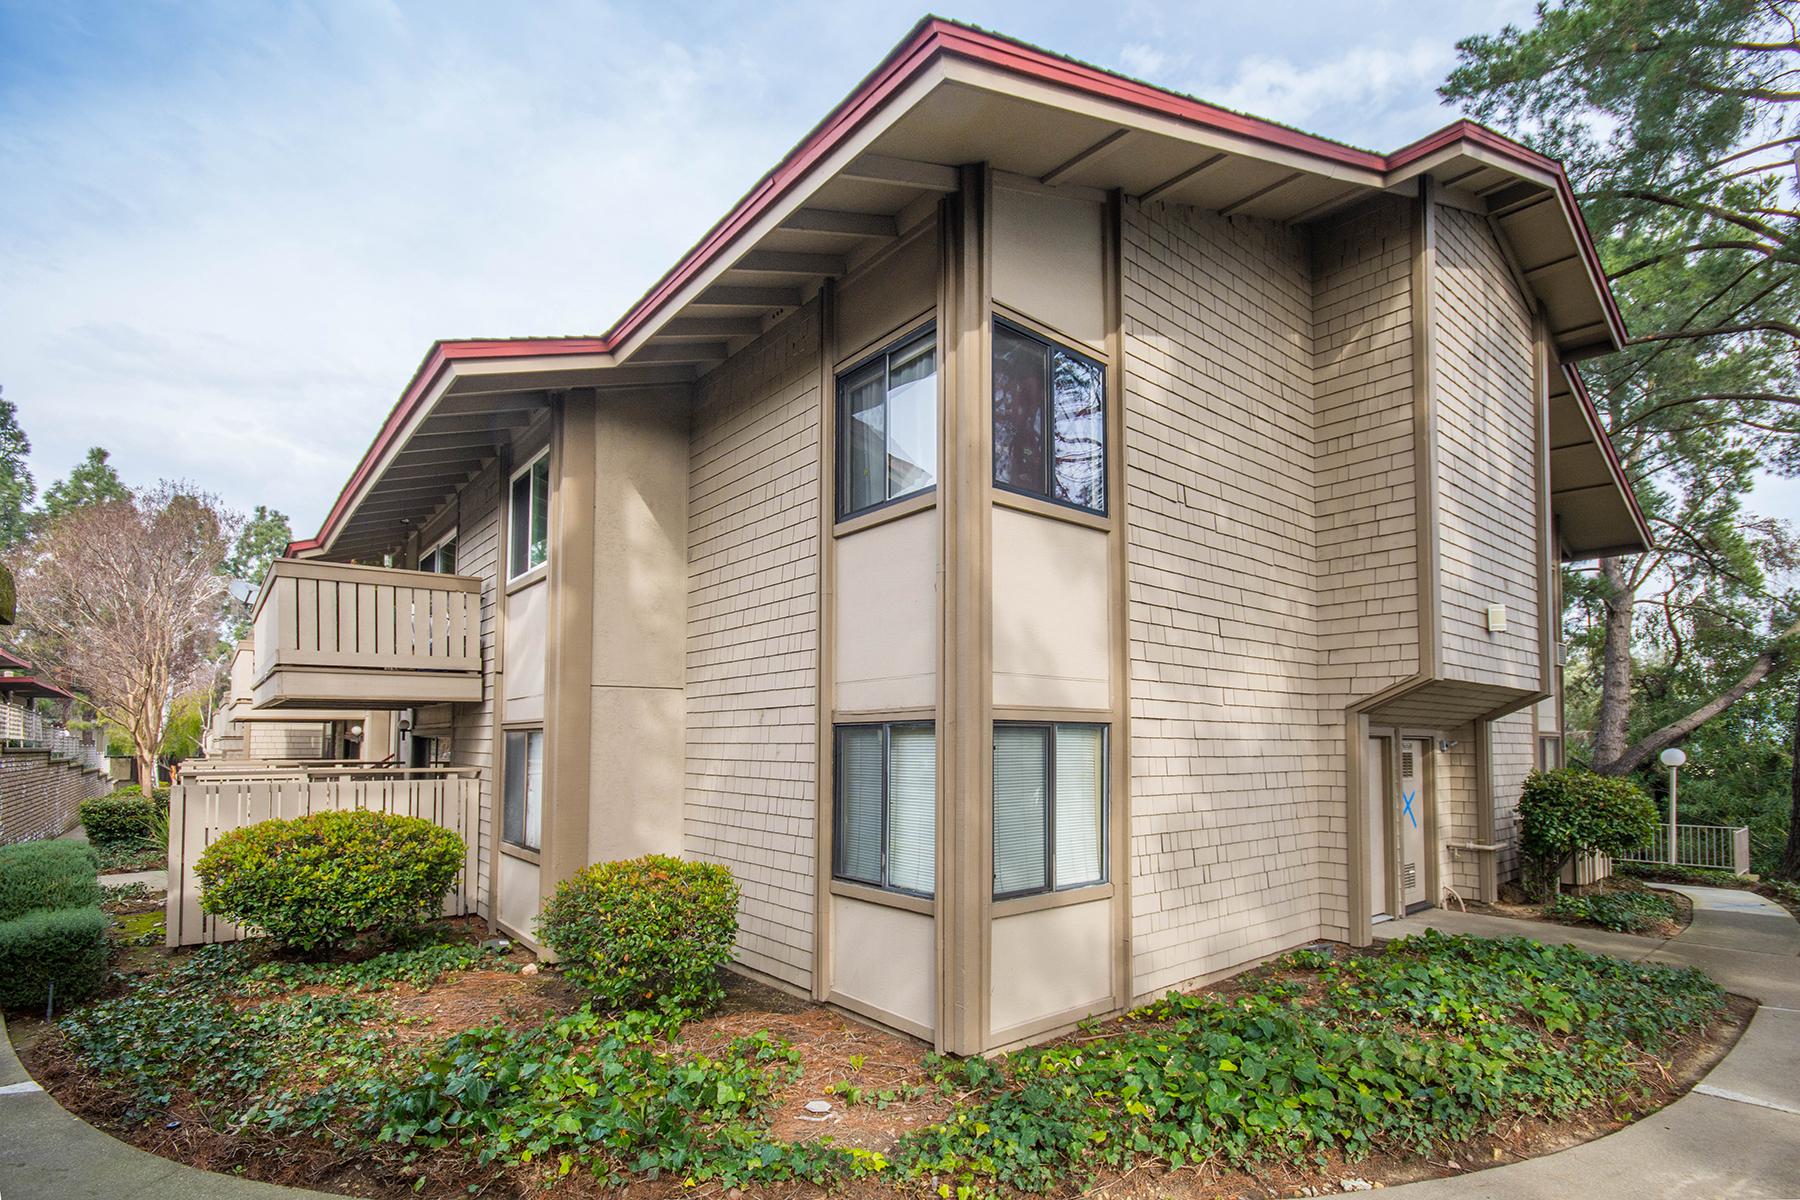 Condominium for Sale at 101 Kinross Dr, Walnut Creek, CA 94598 101 Kinross Dr Walnut Creek, California 94598 United States